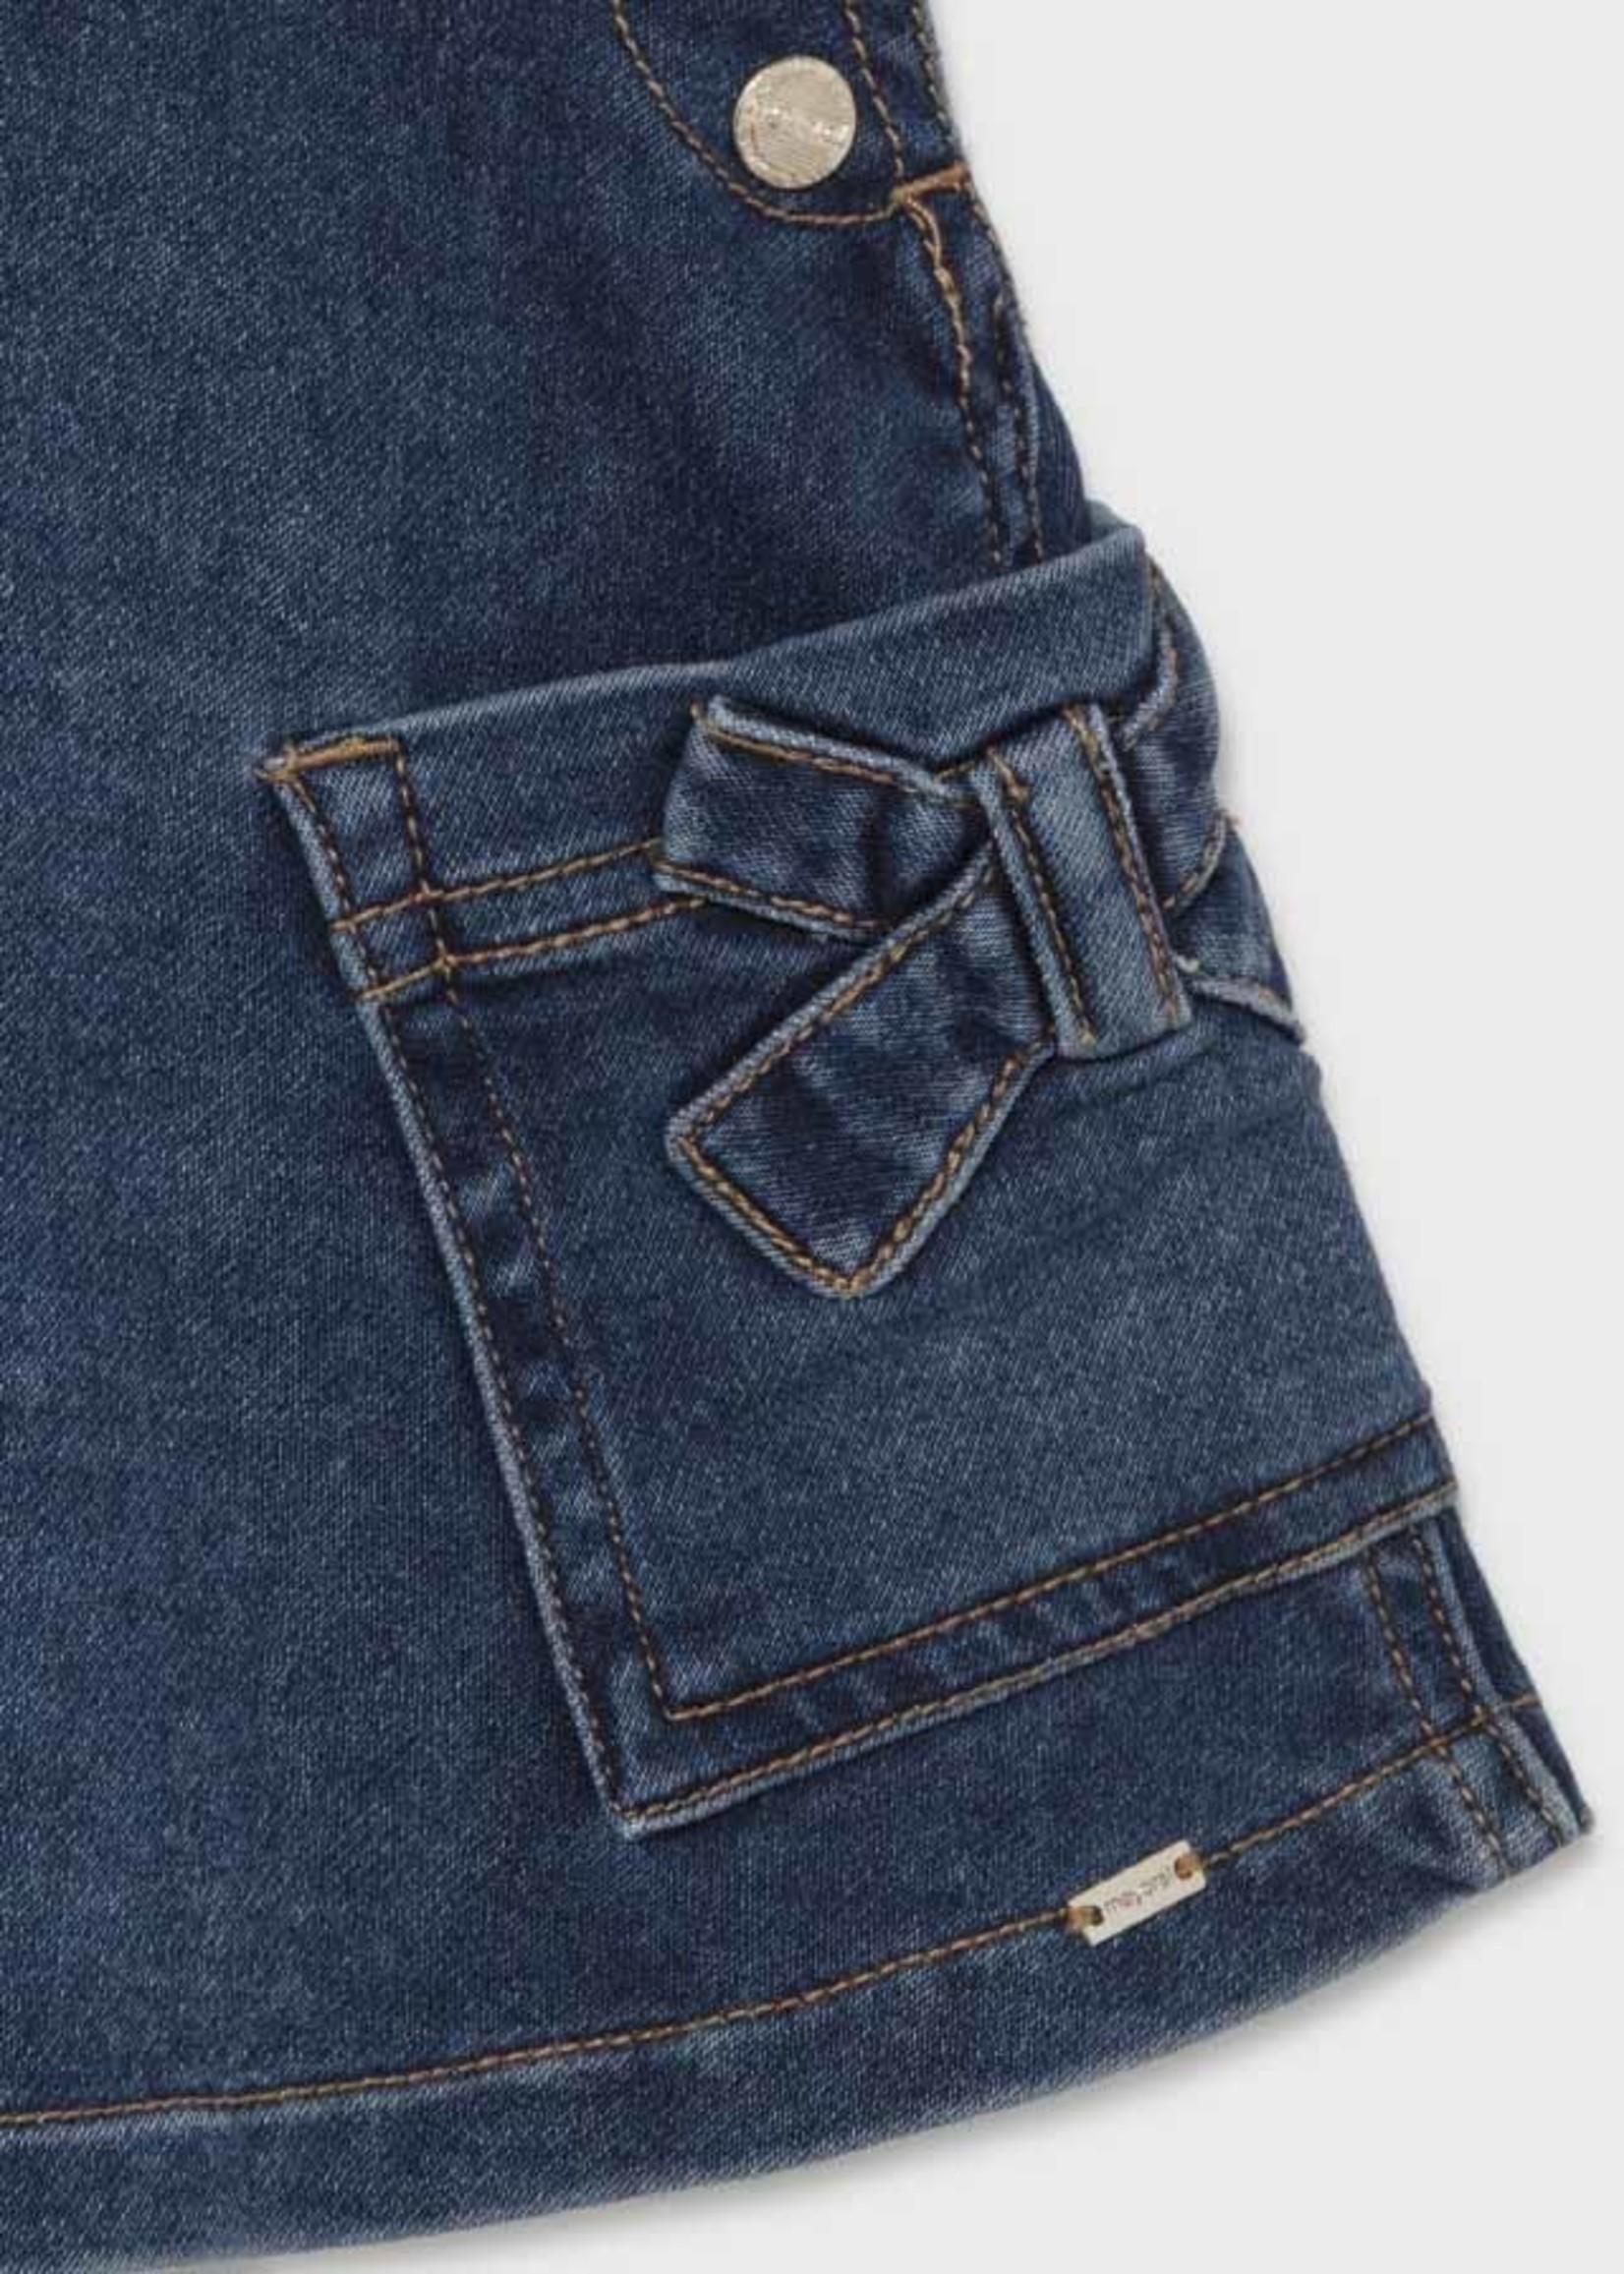 MAYORAL MAYORAL Jeansjurkje dungaree denim